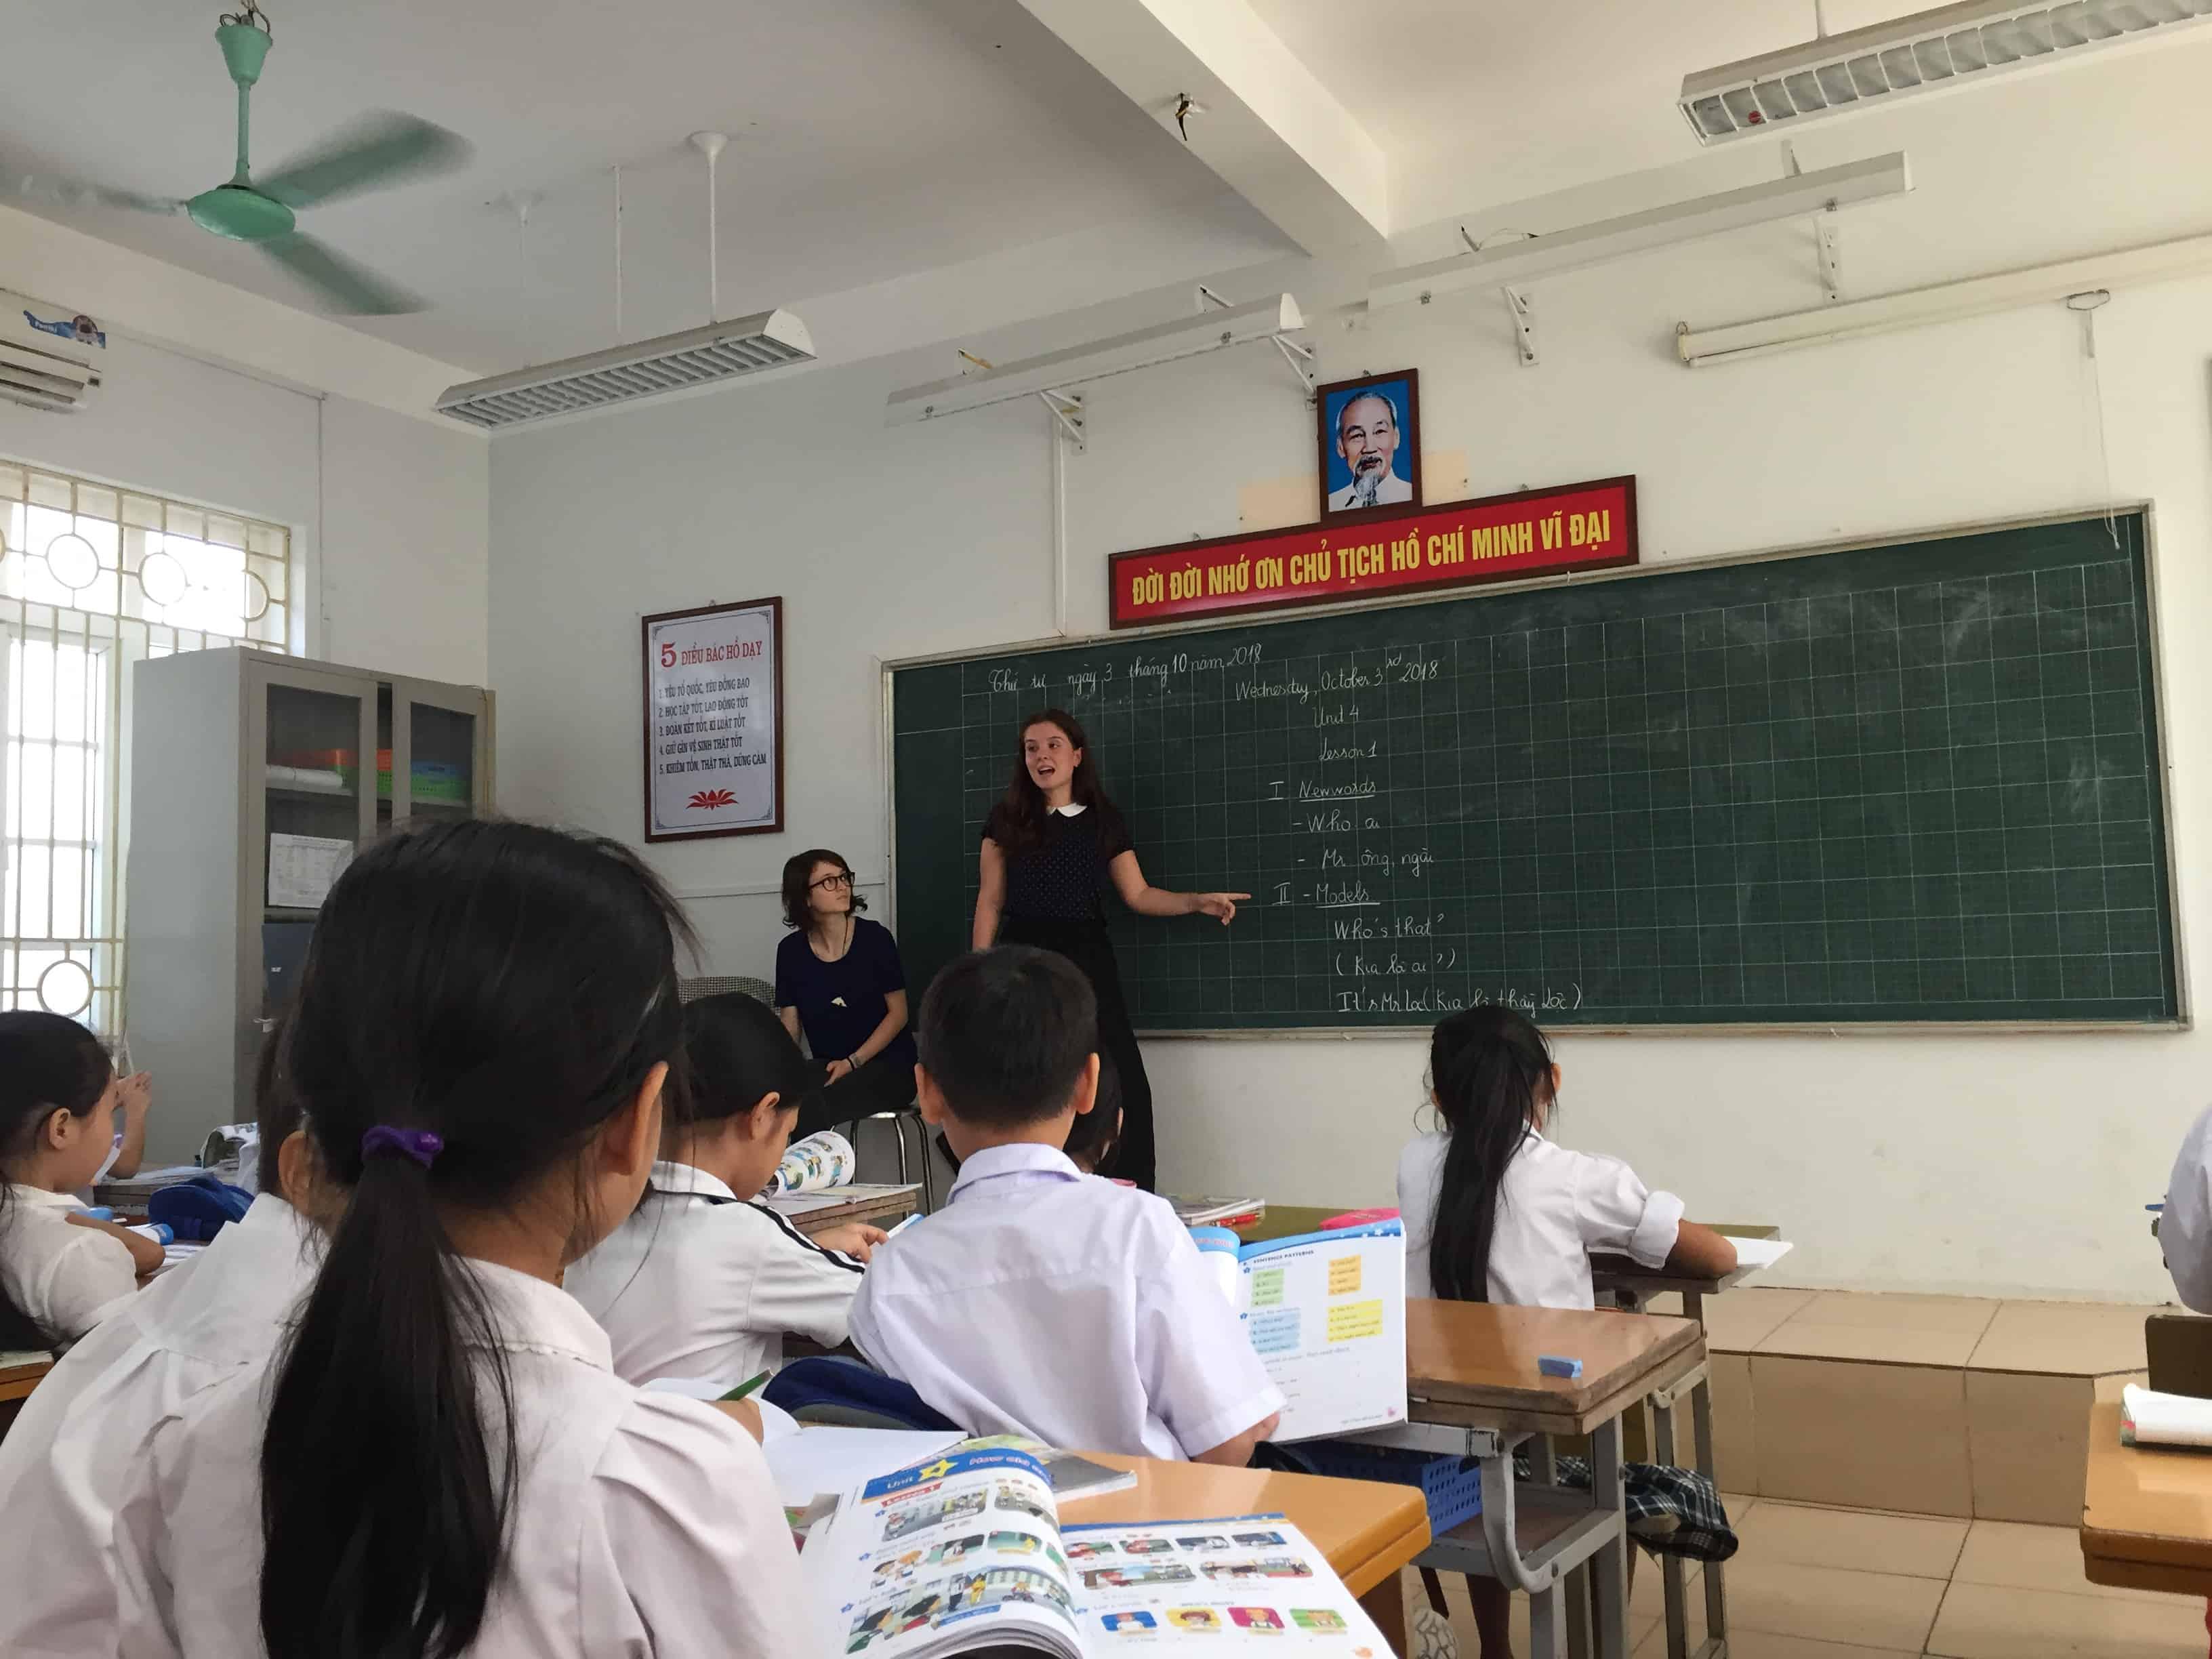 Barbara Eglitis, Vietnam